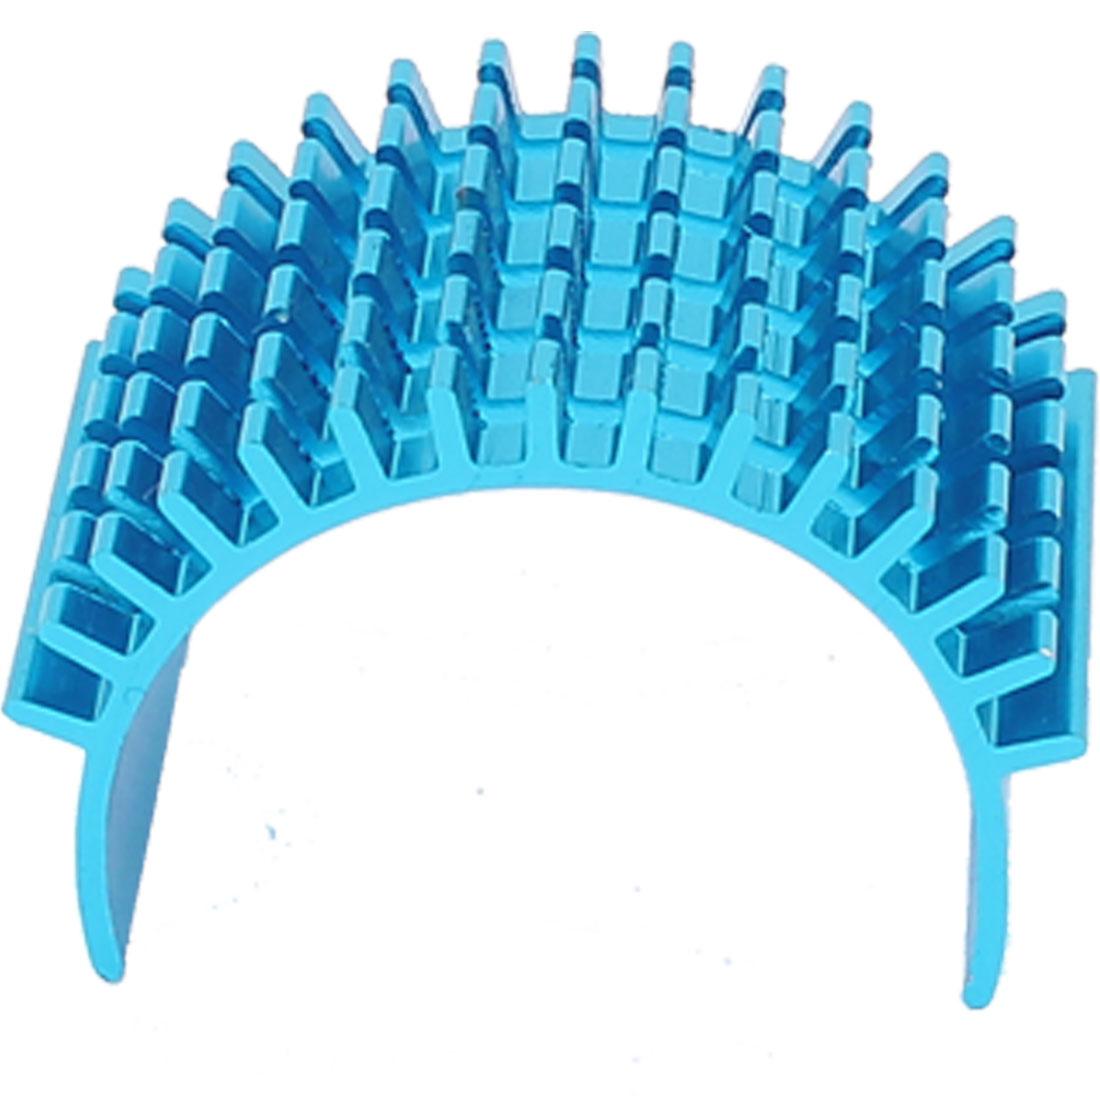 Aluminum Cooling Head Vent Heat Sink Heatsink for 380 Brushless Motor